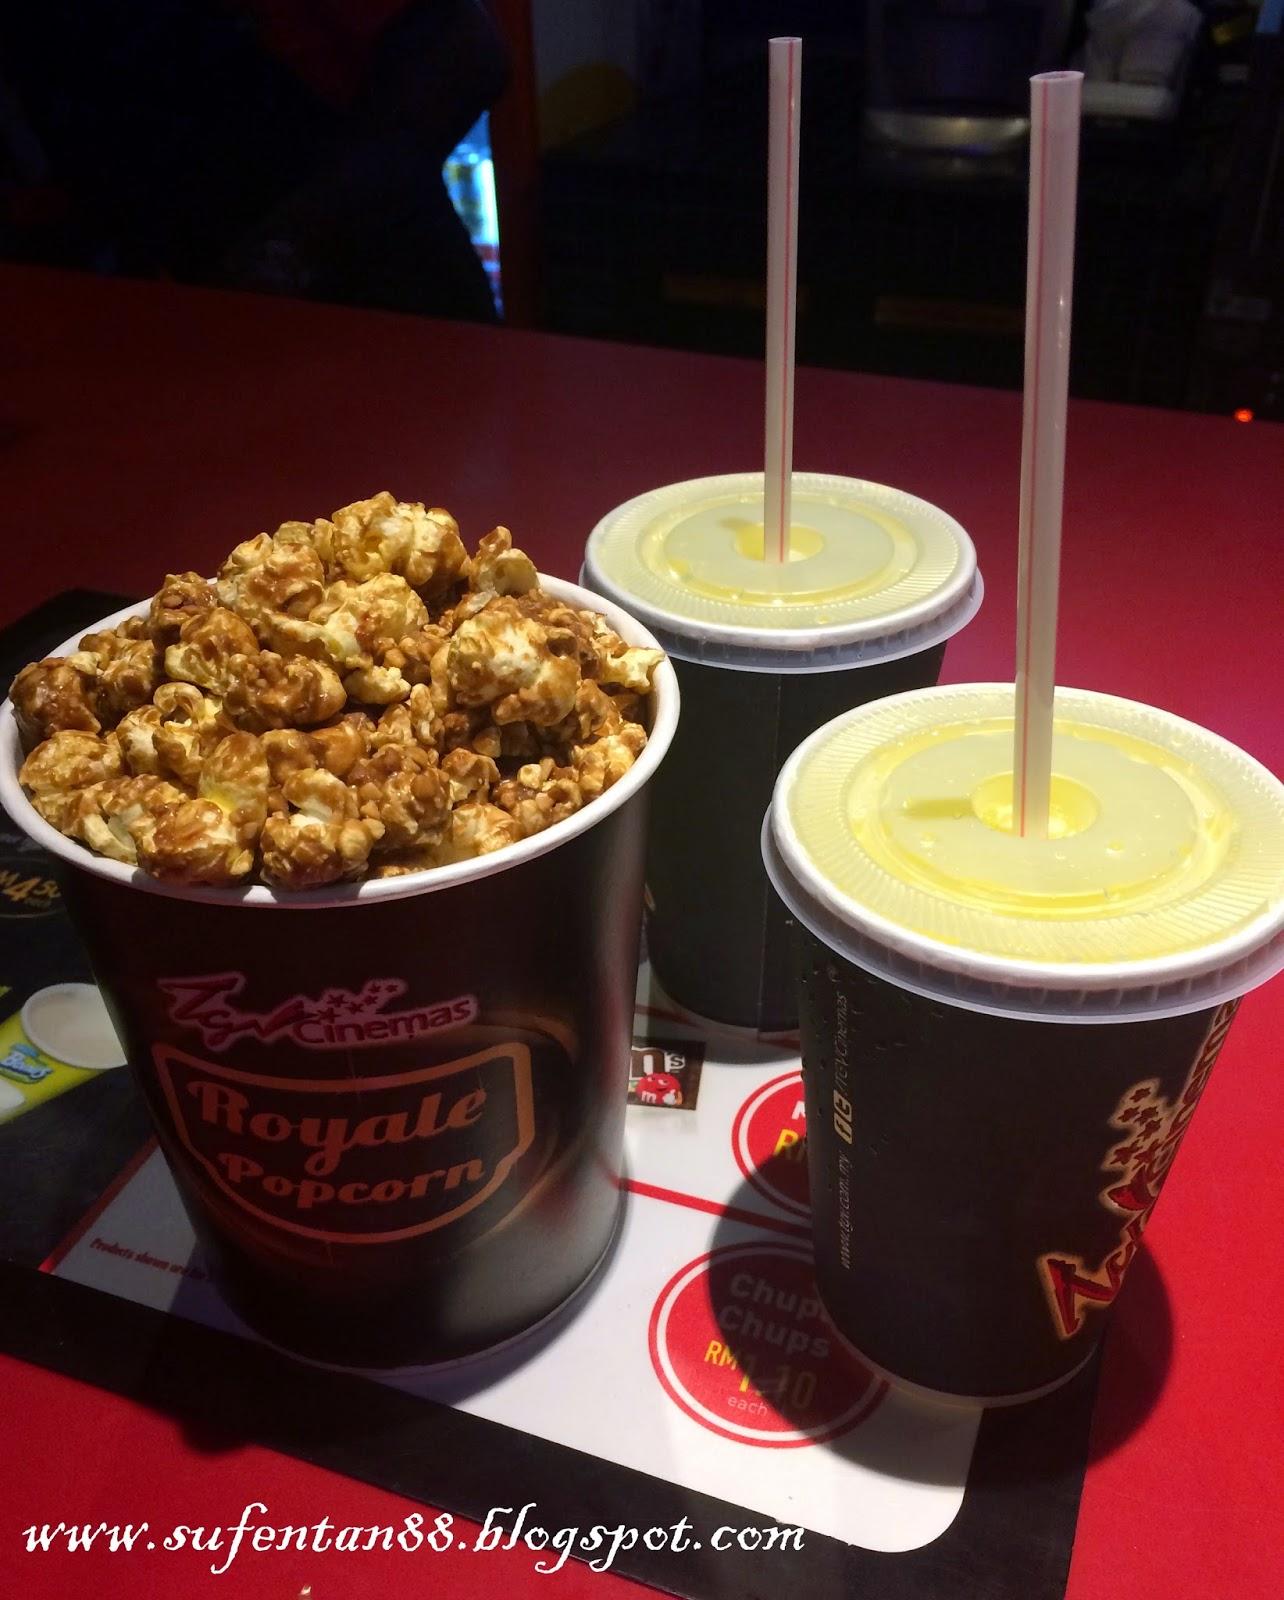 Peanuts royale popcorn tgv cinemas sufentan com for Cocktail tgv